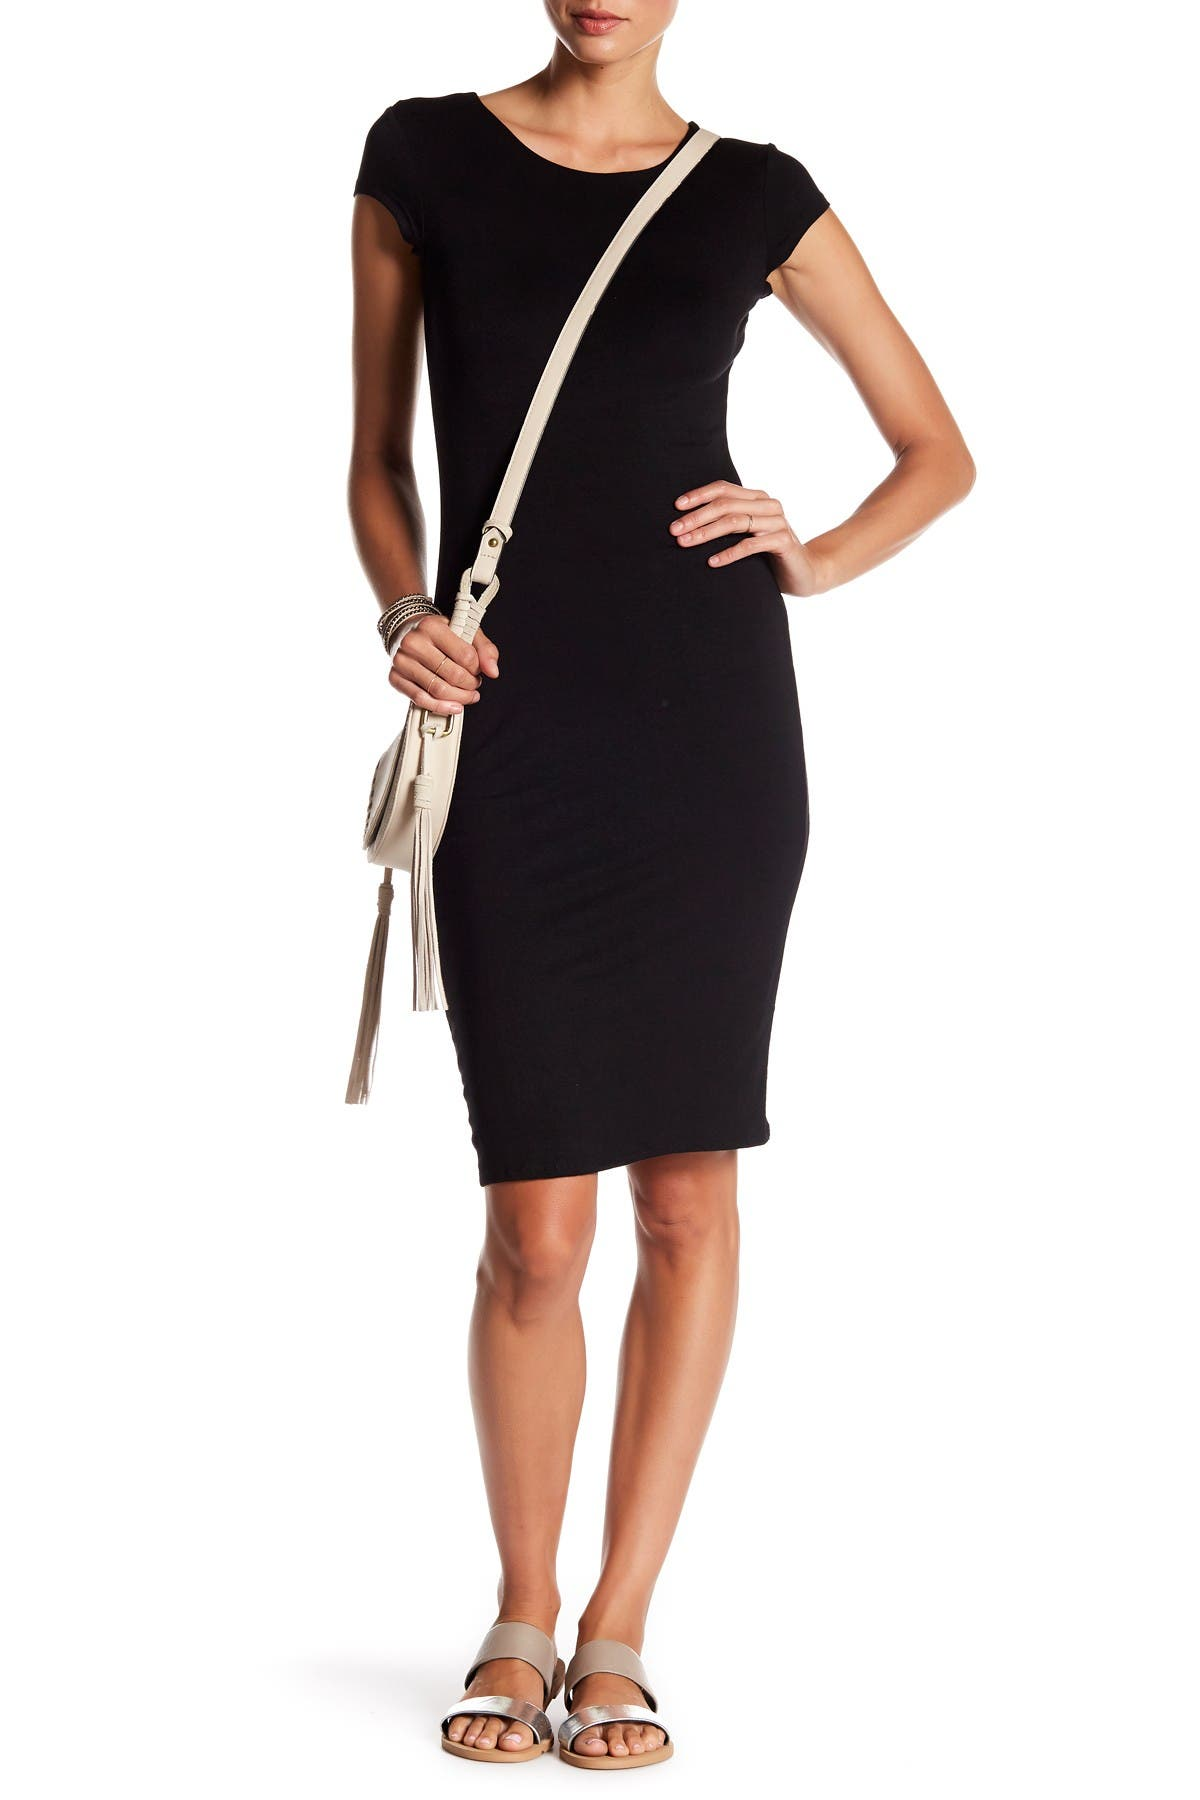 Image of Velvet Torch Cap Sleeve Bodycon Dress